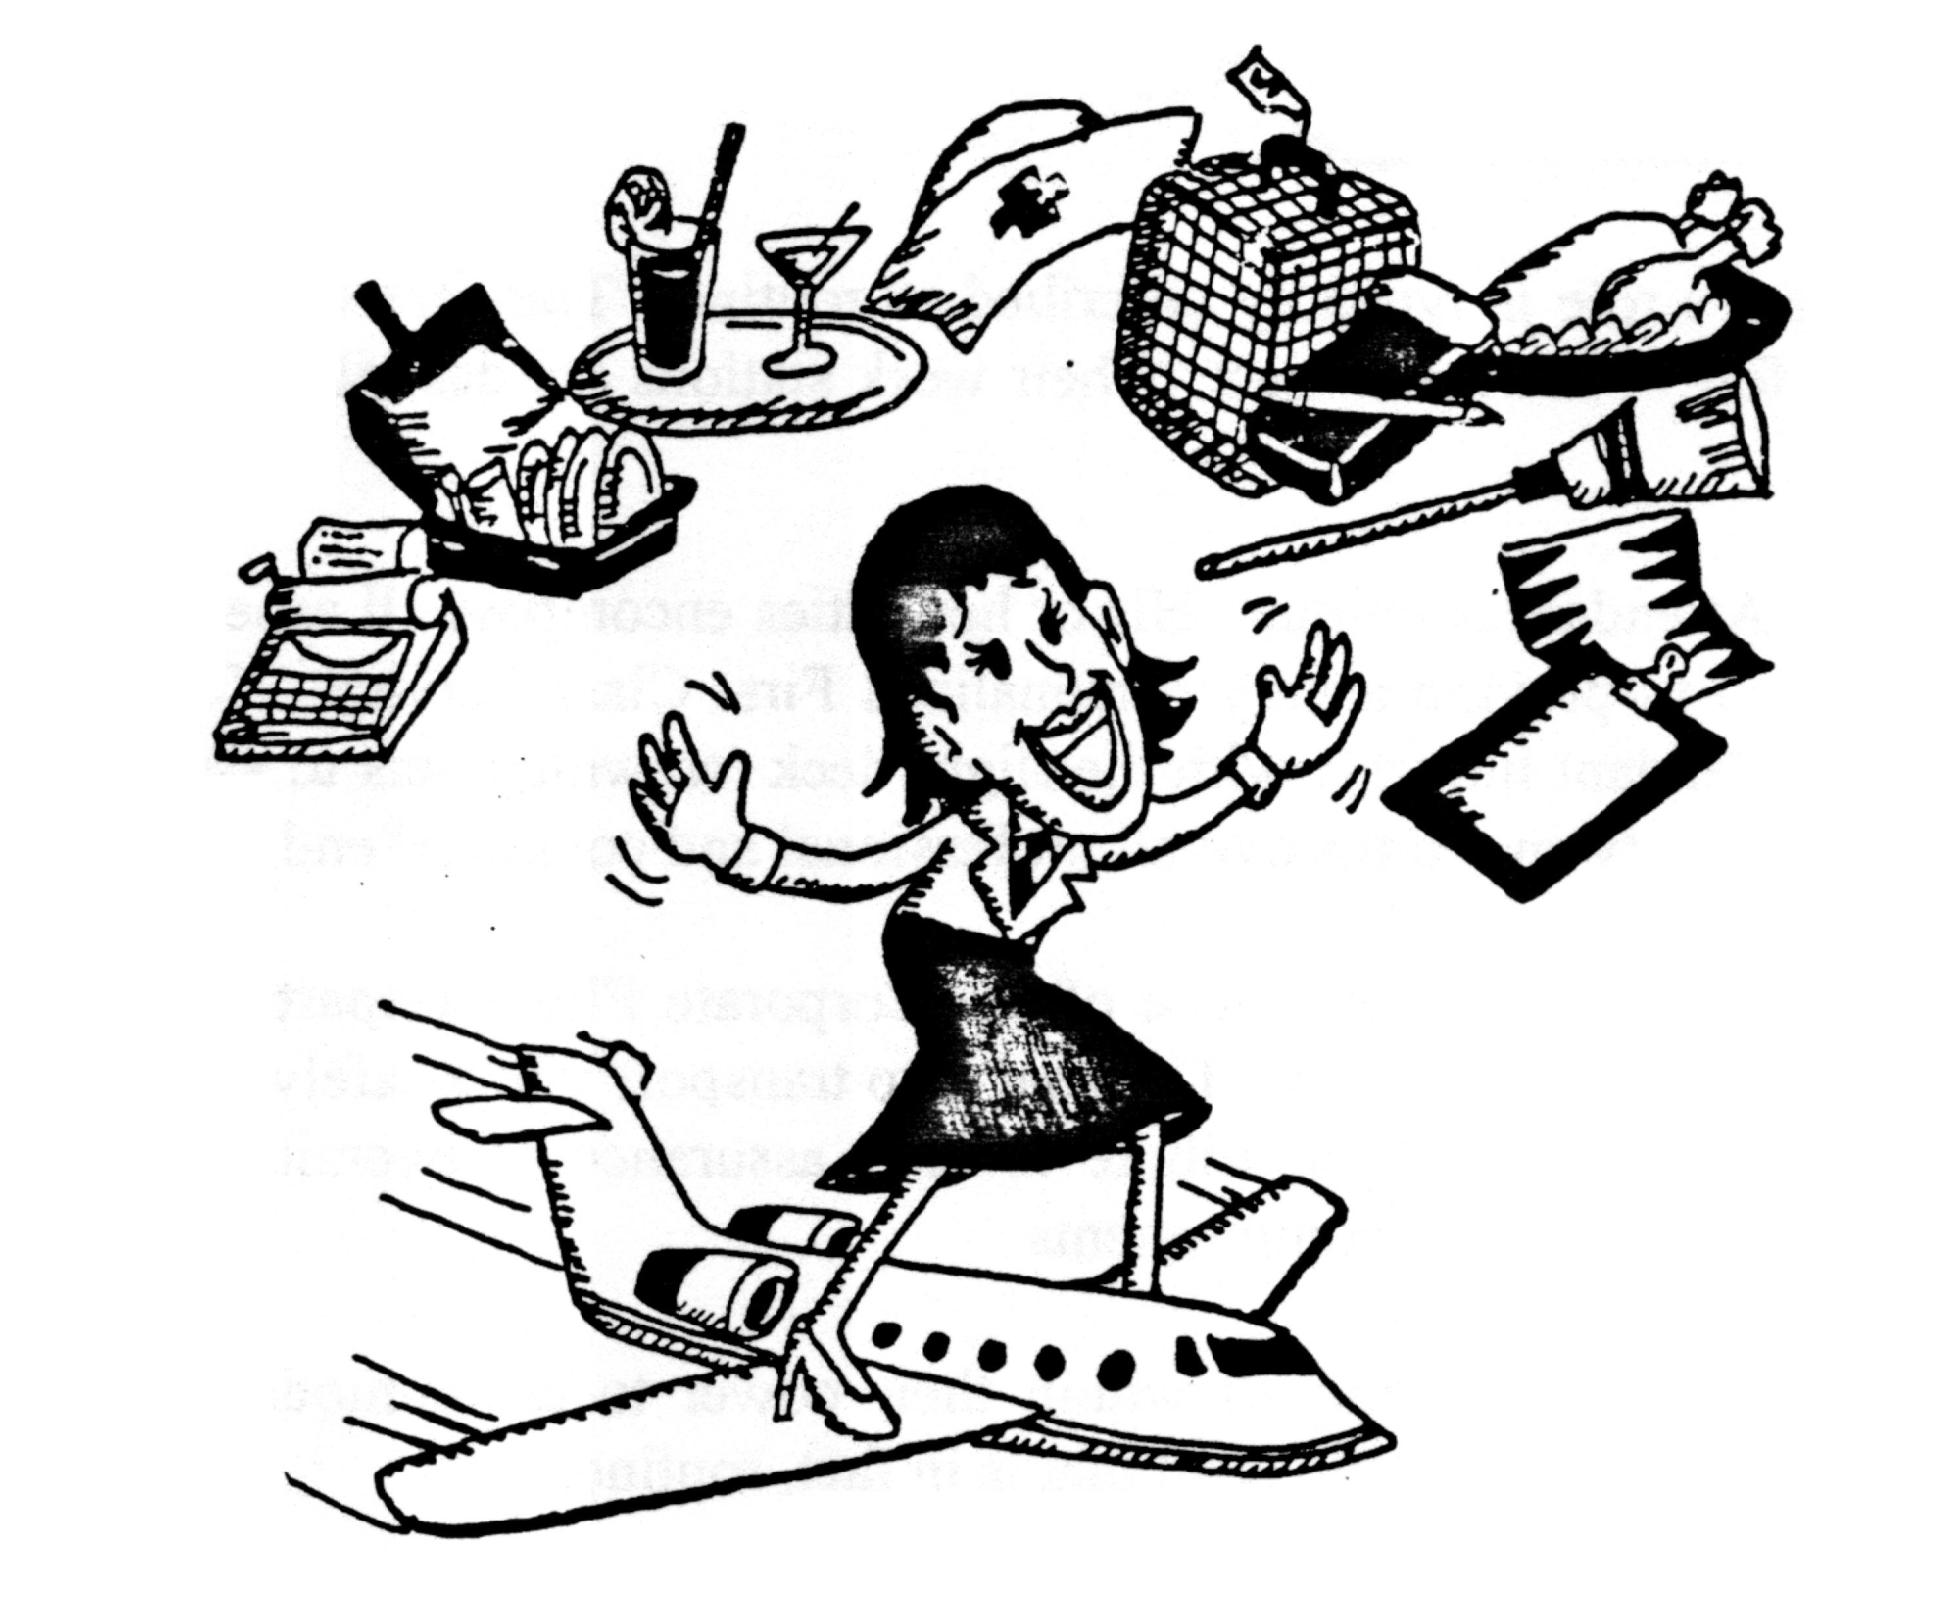 1940x1619 The Corporate Flight Attendant